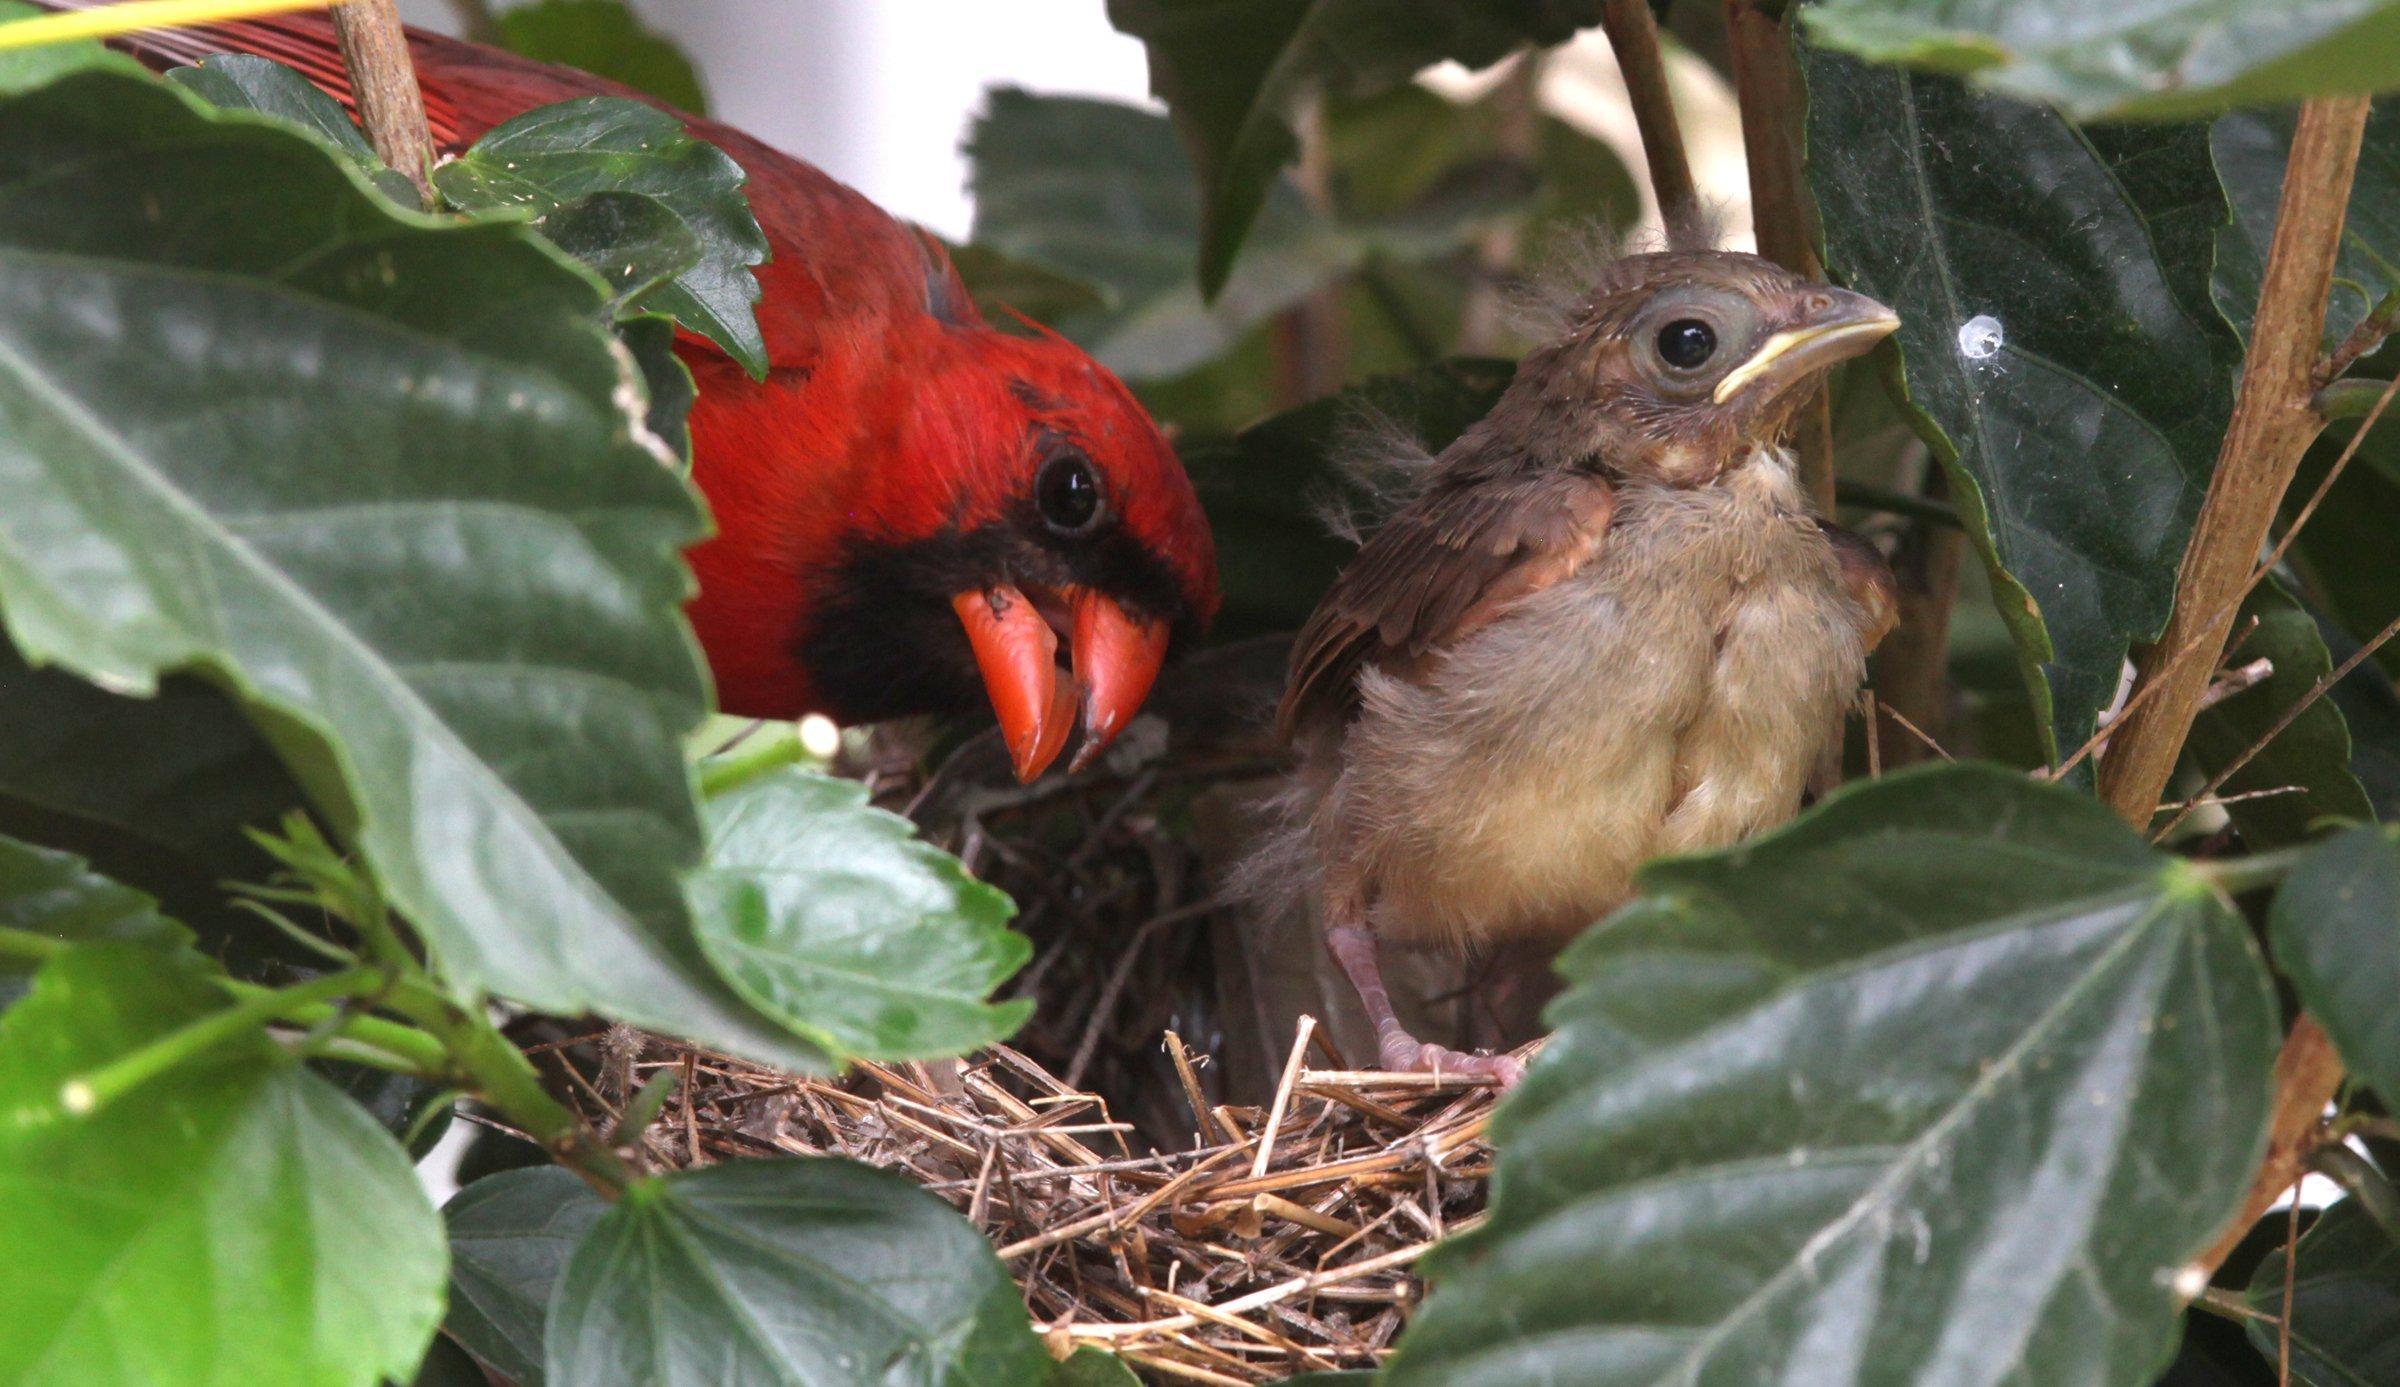 red bird nest and - photo #23